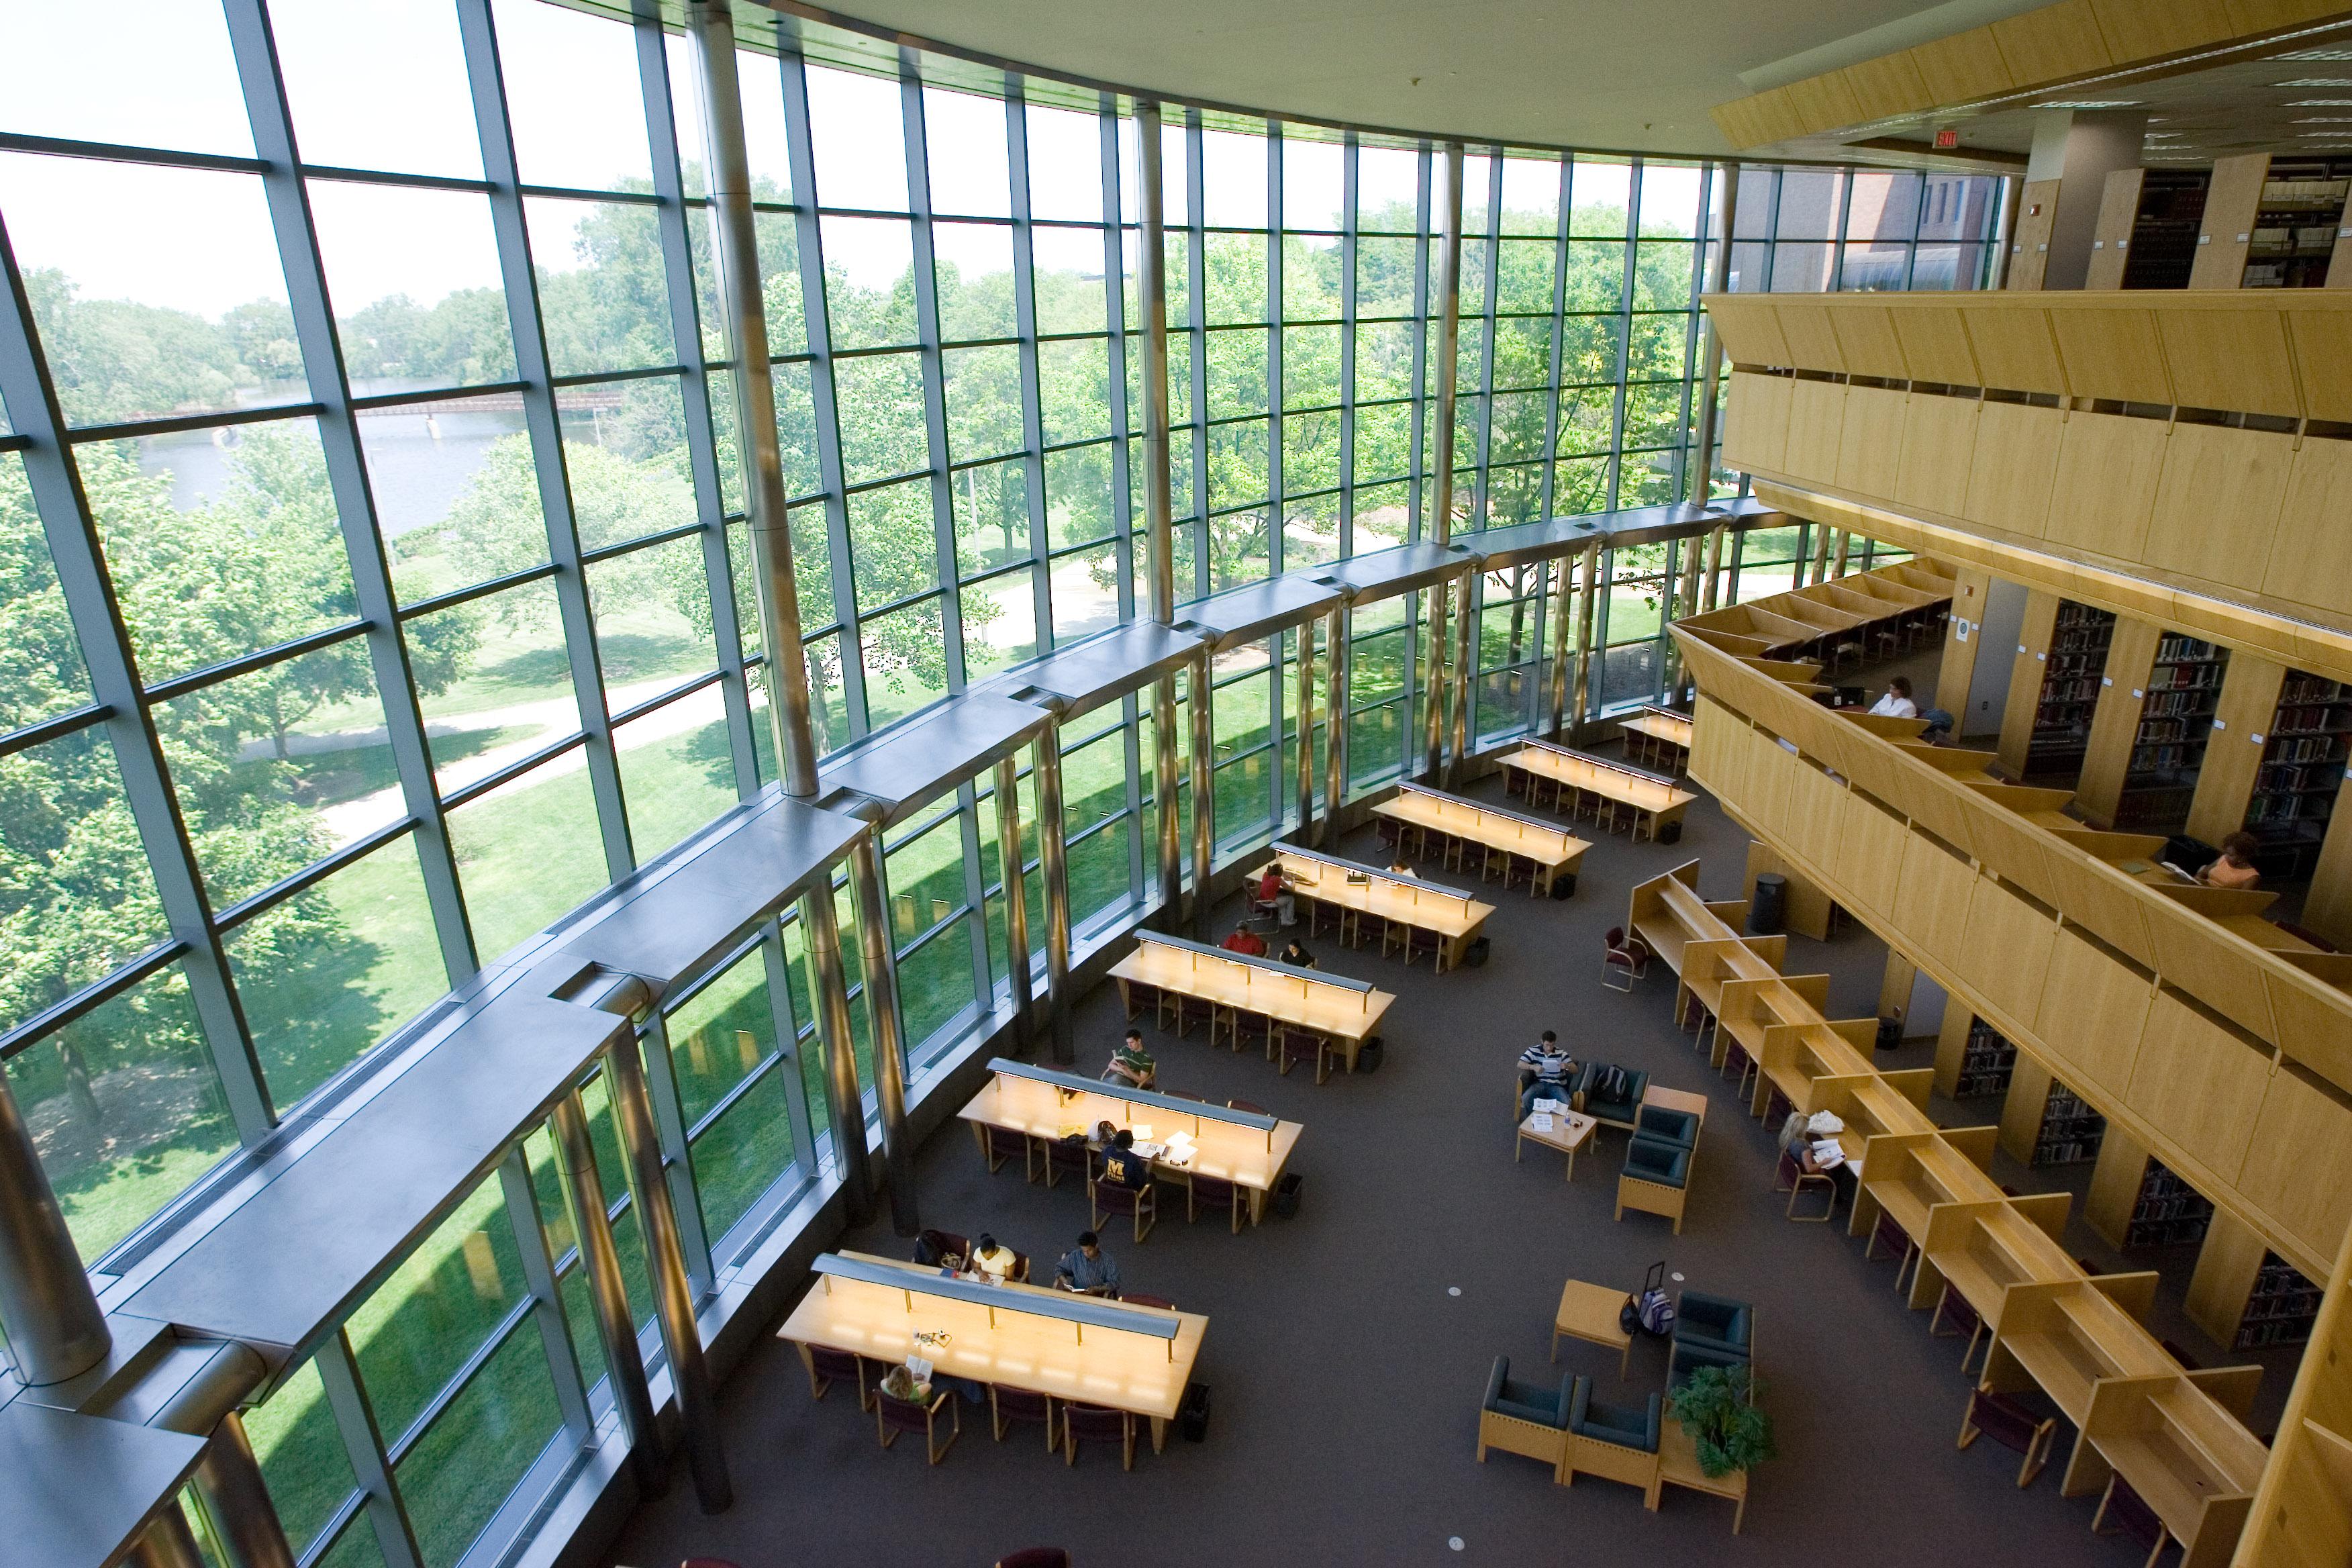 university of michigan library